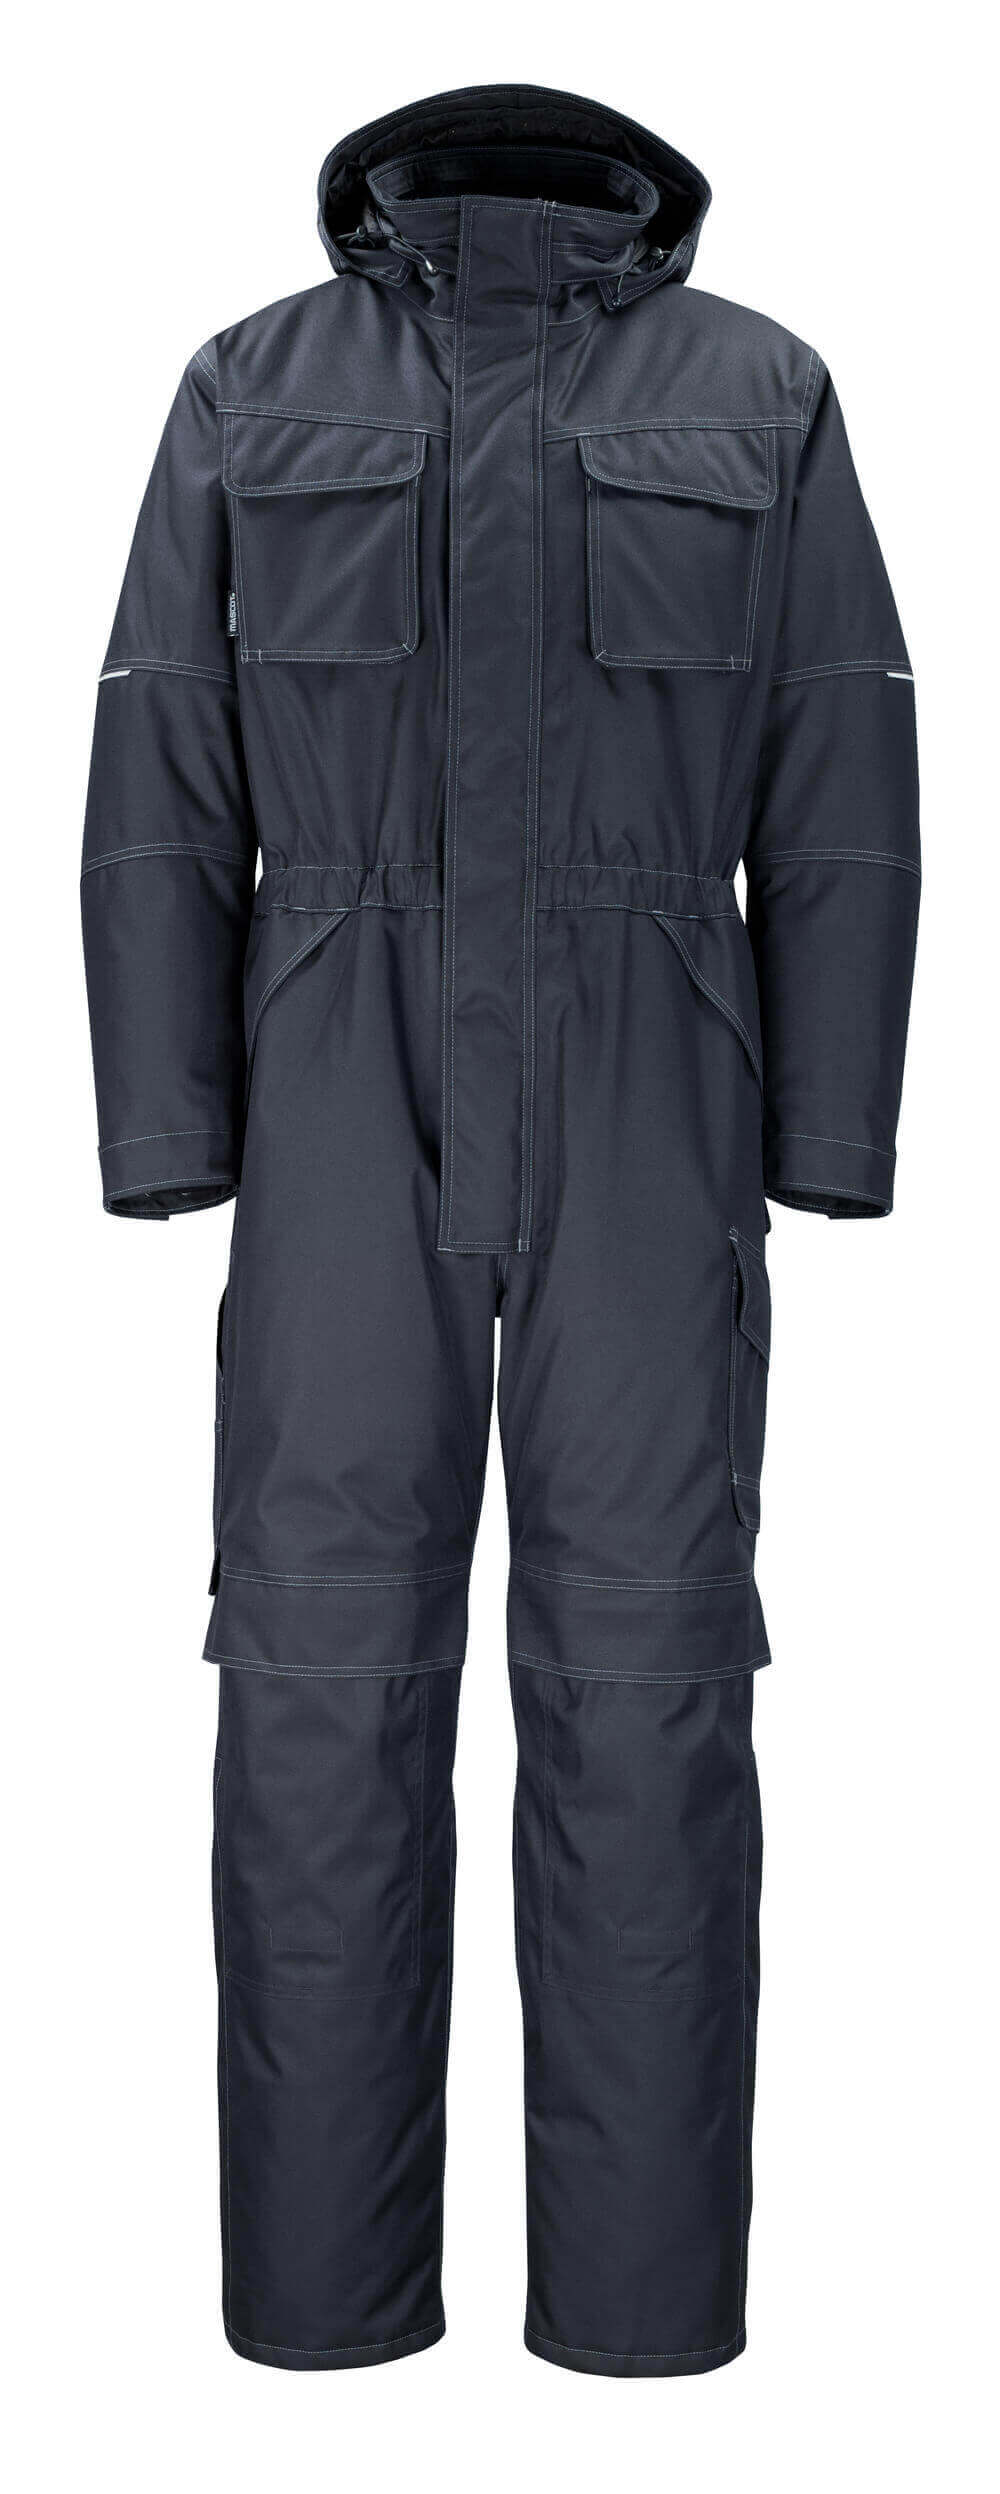 14119-194-010 Mono de invierno - azul marino oscuro